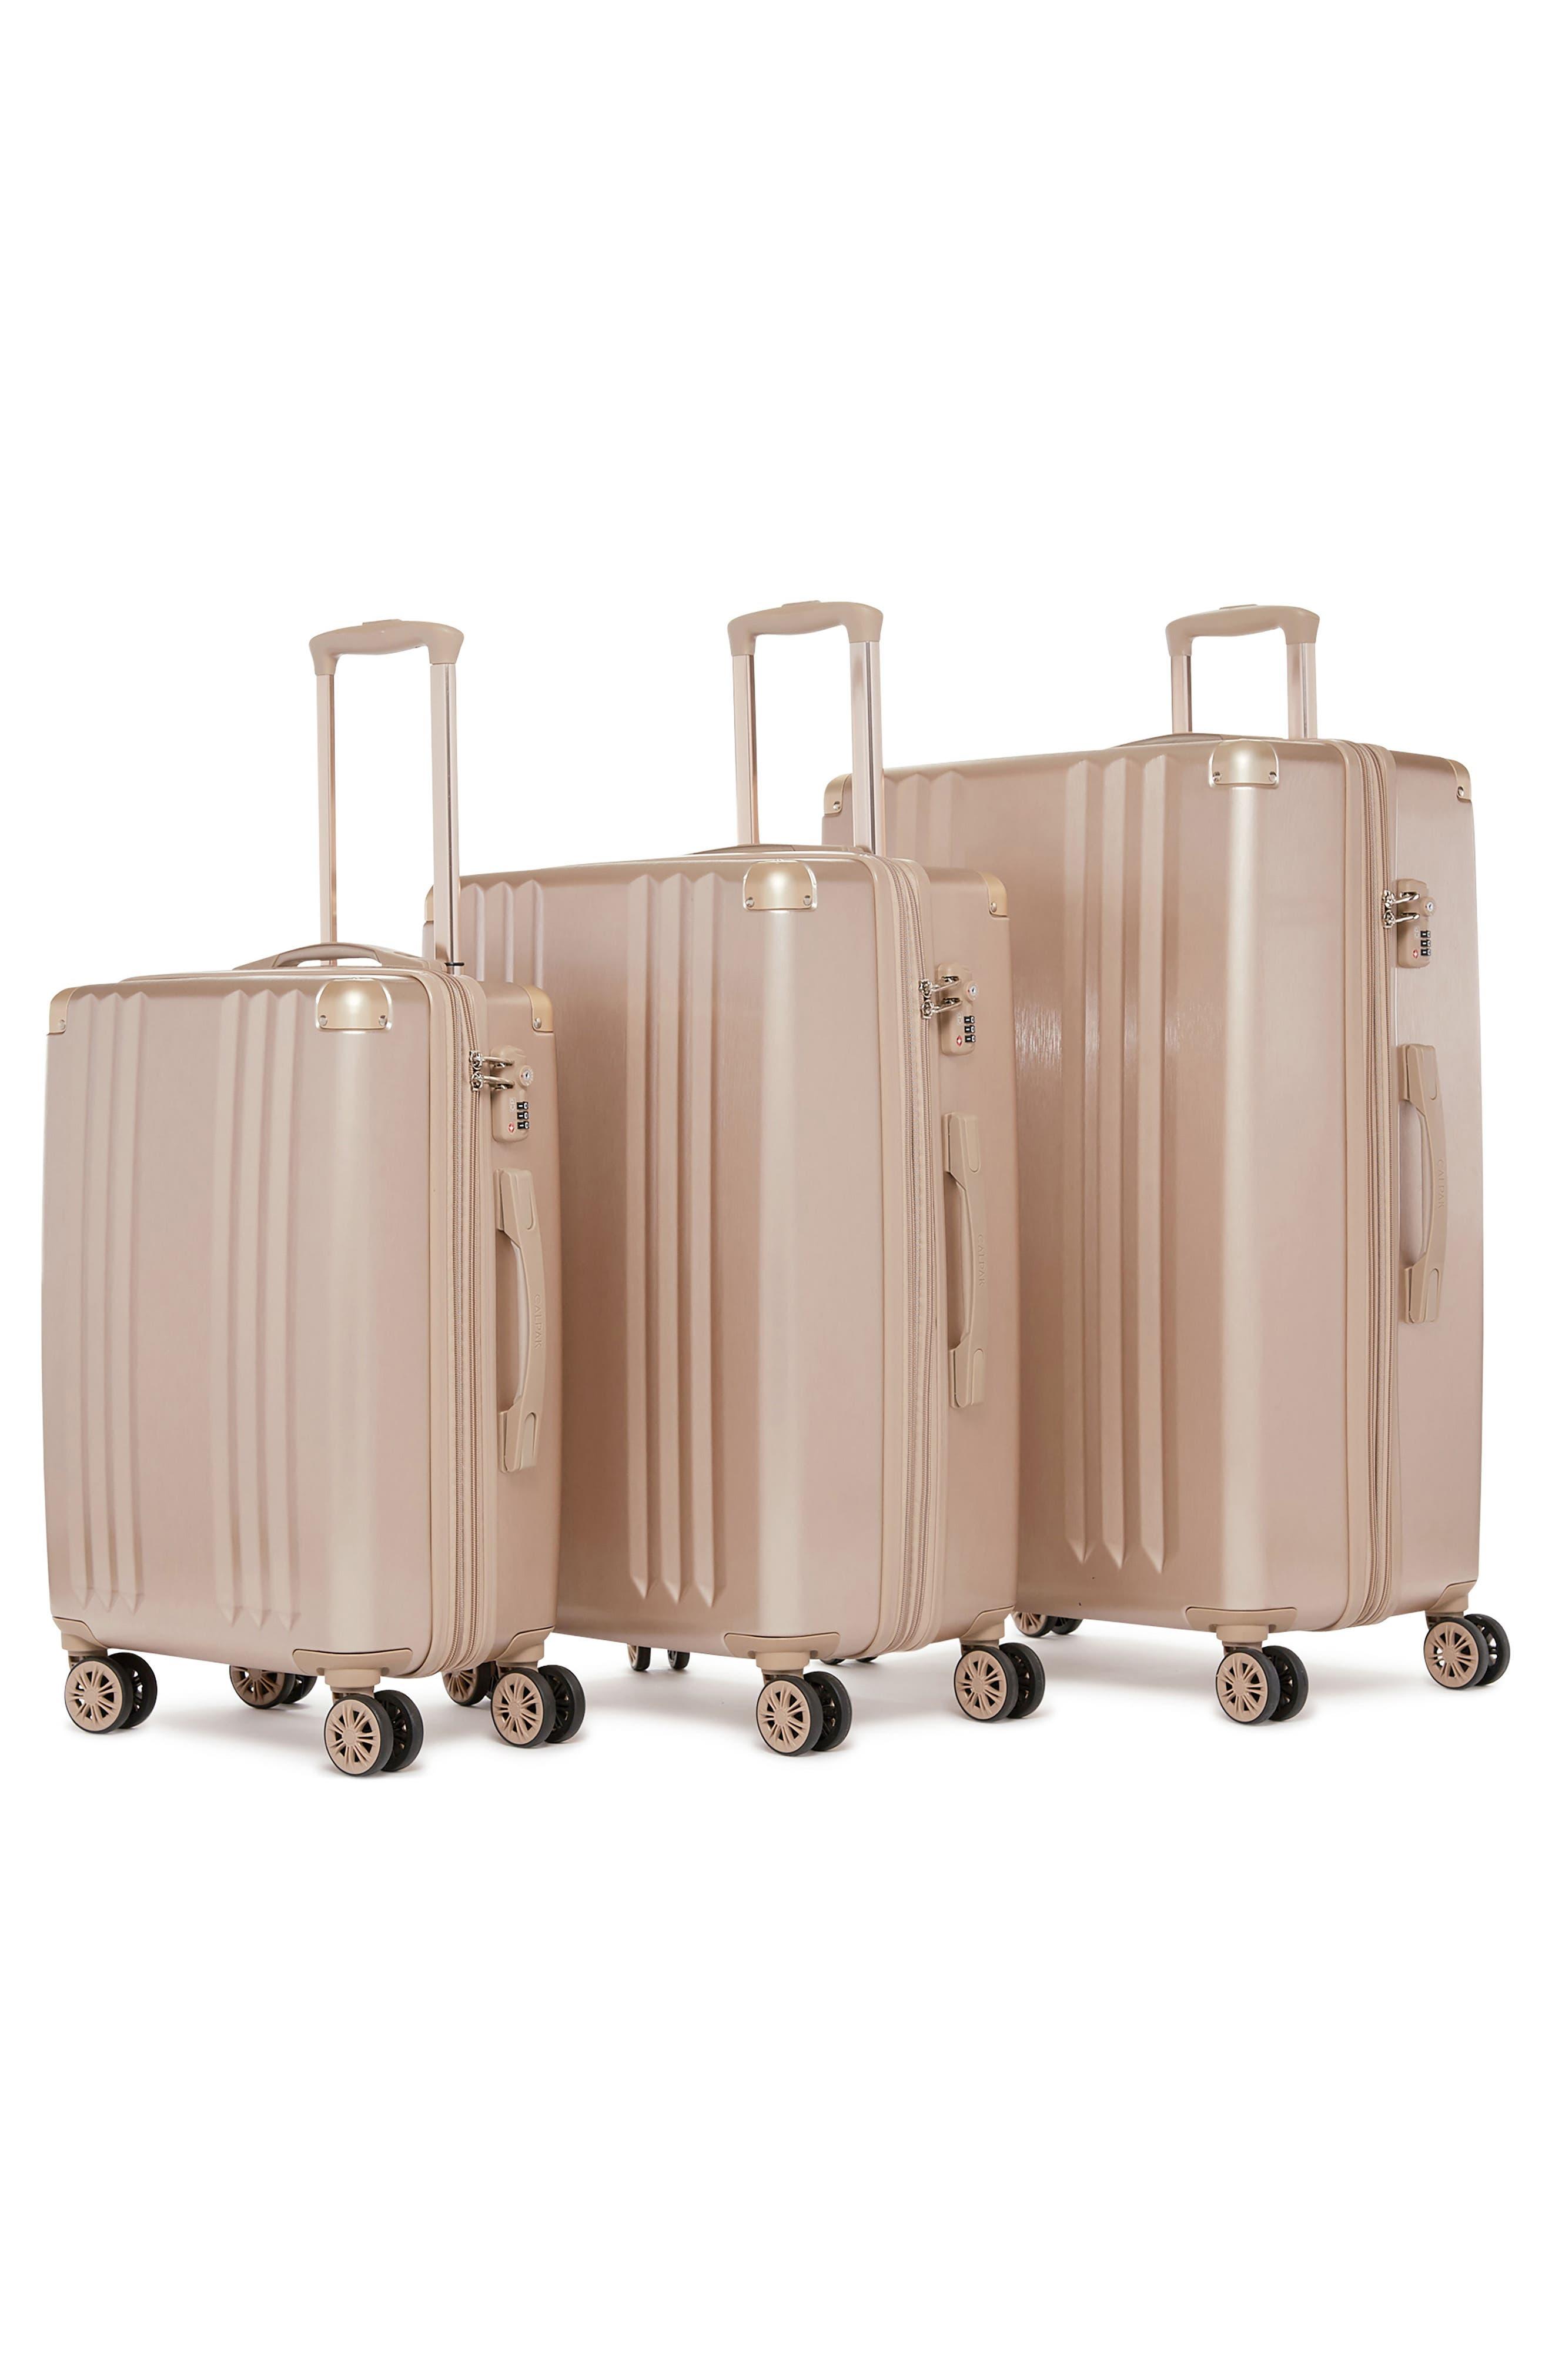 Ambeur 3-Piece Metallic Luggage Set,                             Alternate thumbnail 2, color,                             GOLD